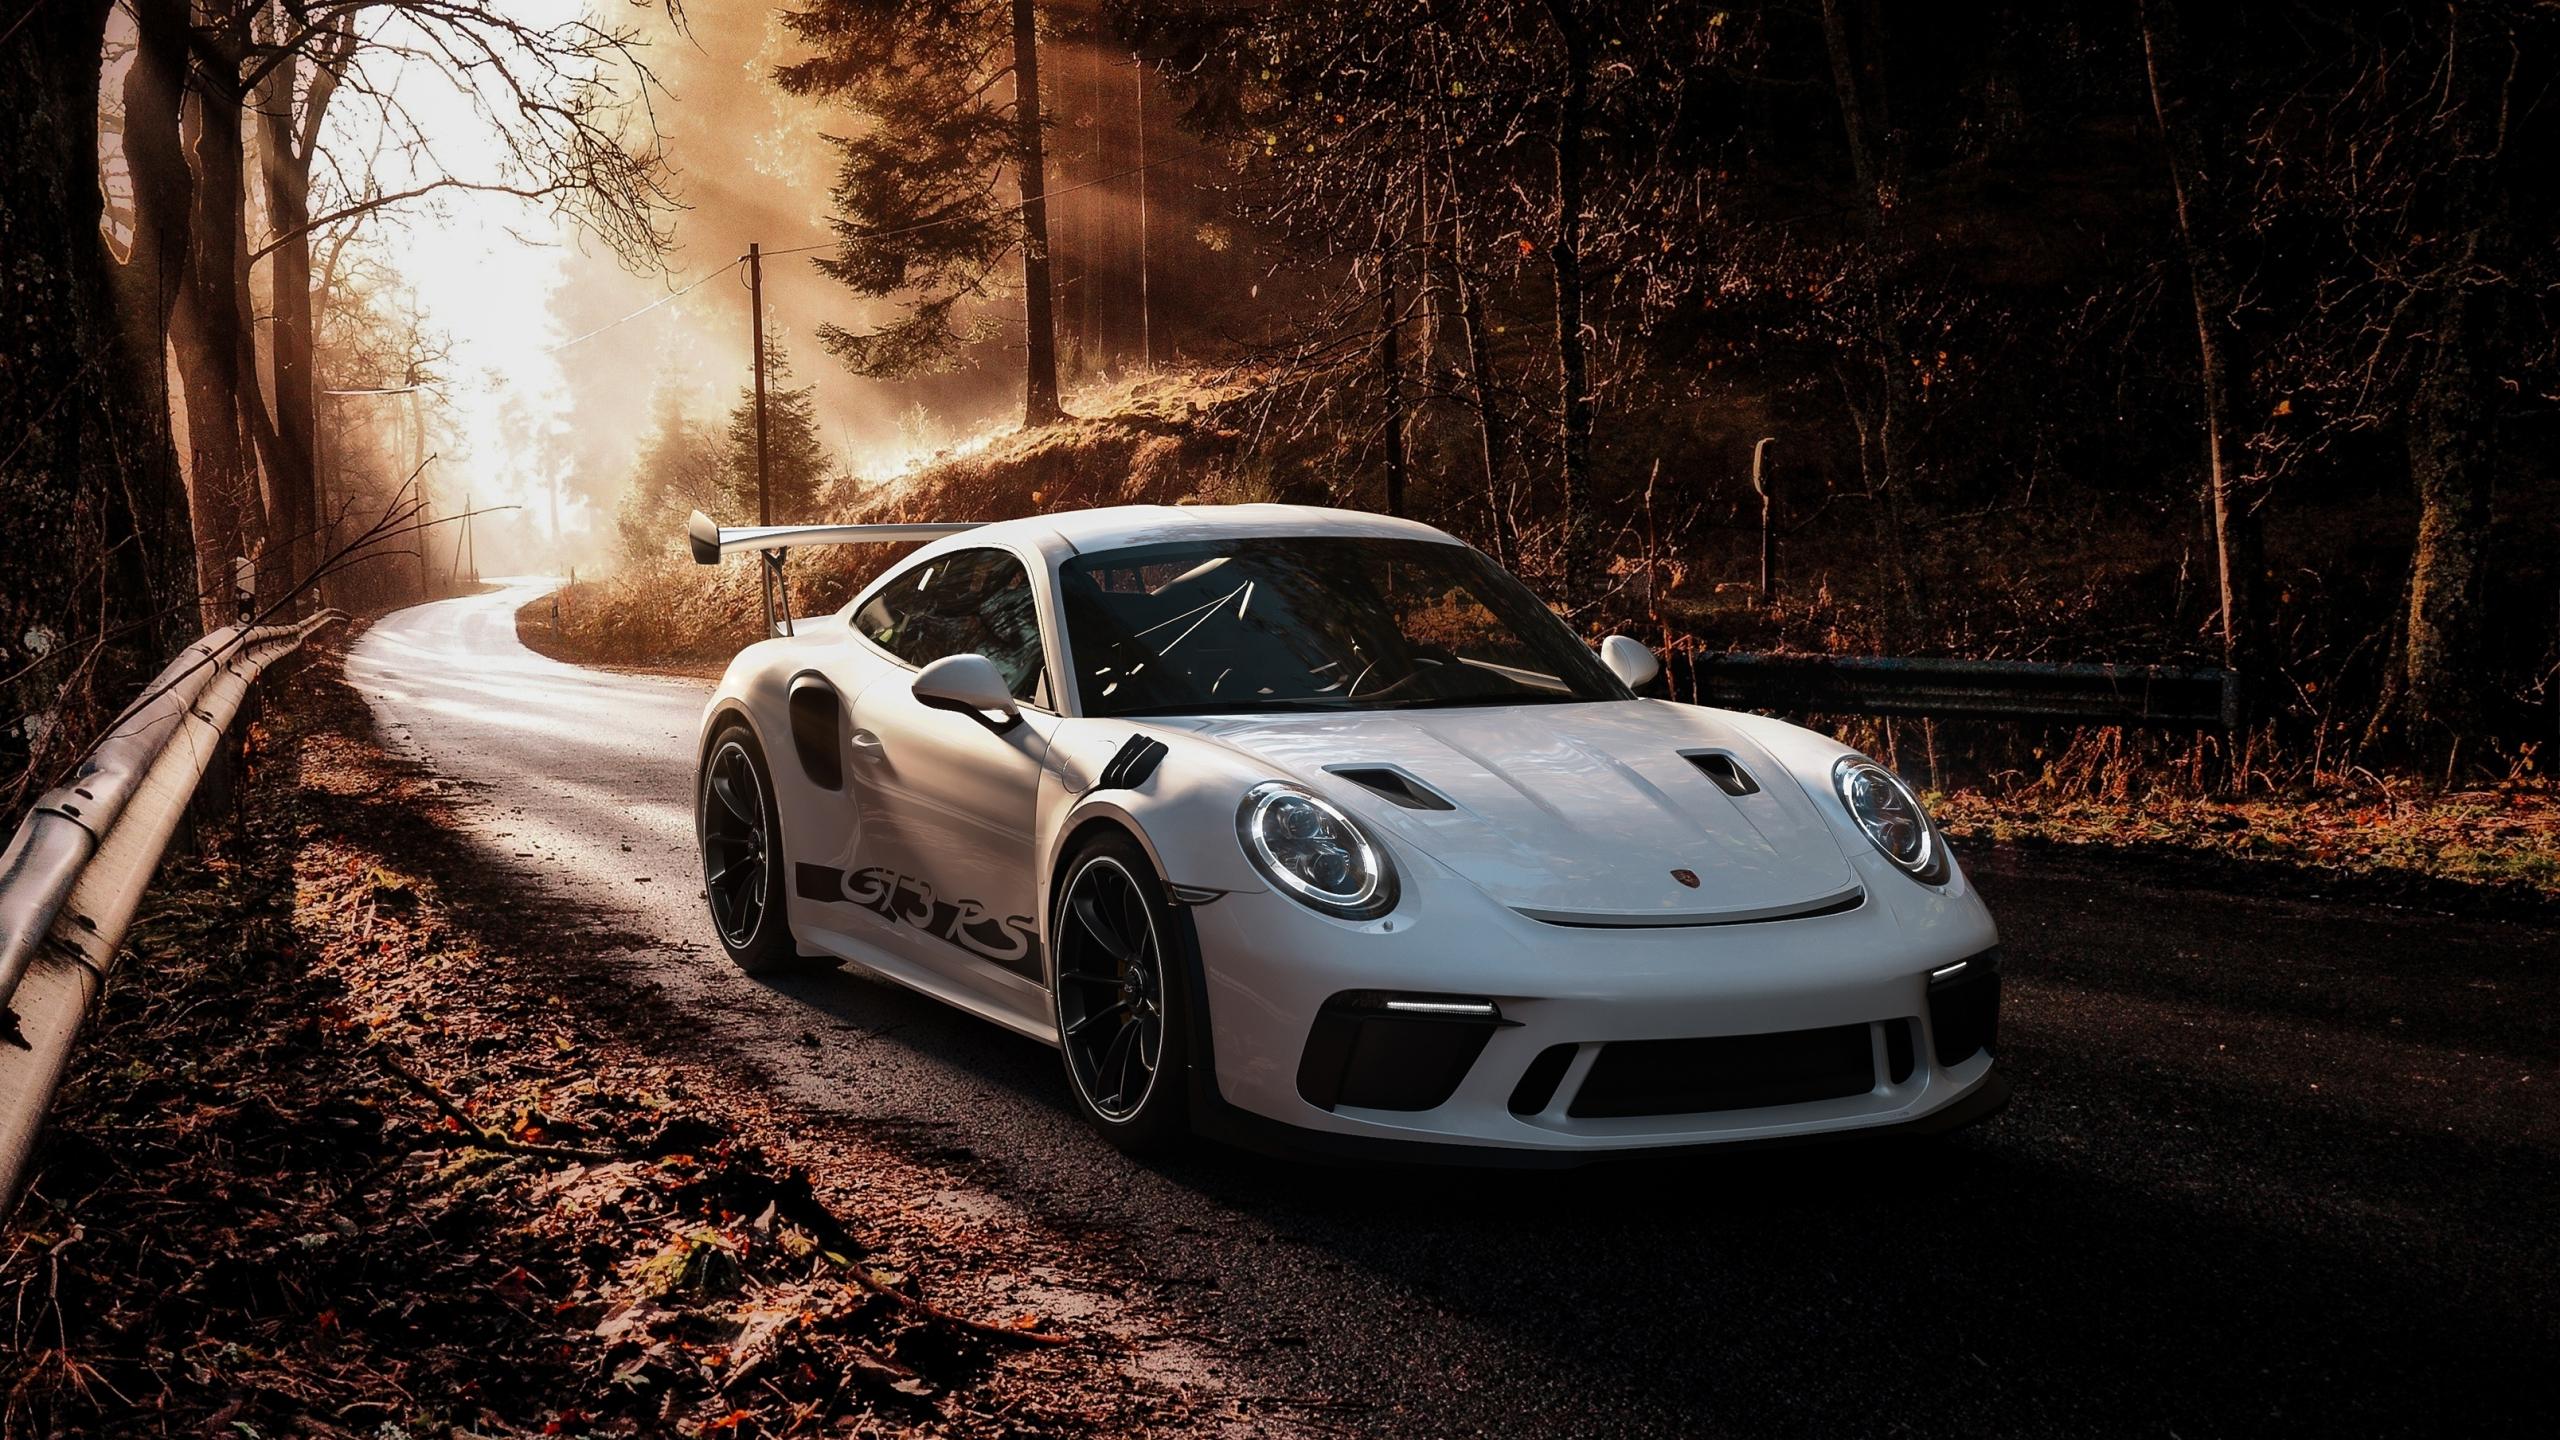 Download 2560x1440 Wallpaper Porsche 911 Gt3 Rs 2019 Dual Wide Widescreen 16 9 Widescreen 2560x1440 Hd Image Background 17192